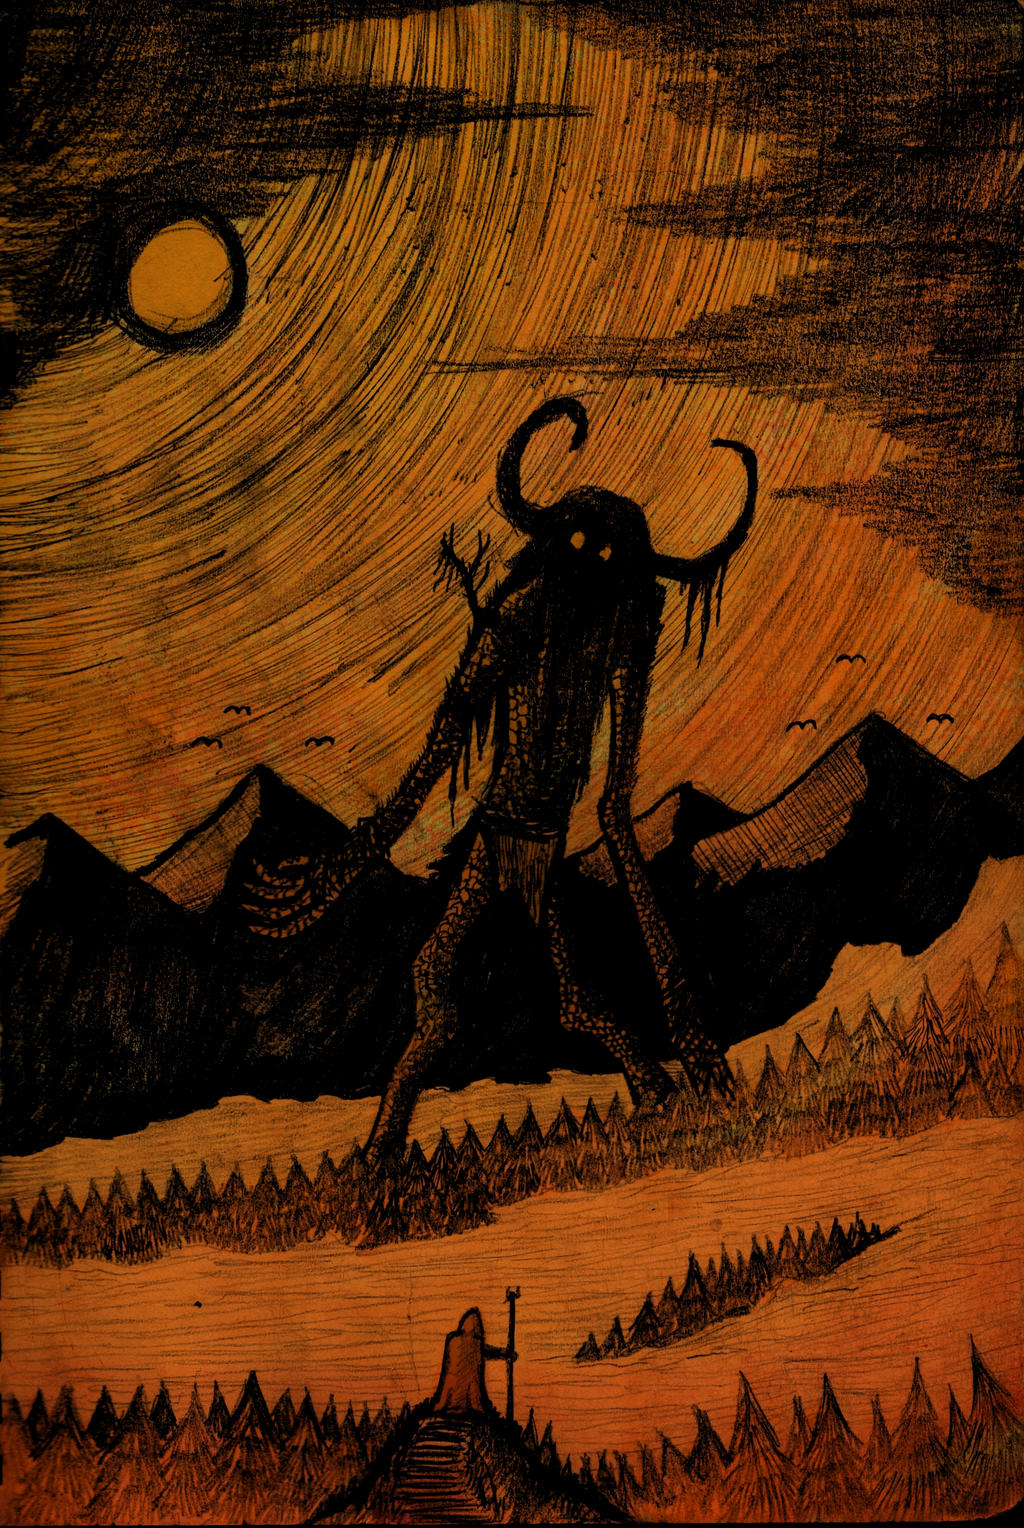 Greeting the Horizon by hellduriel